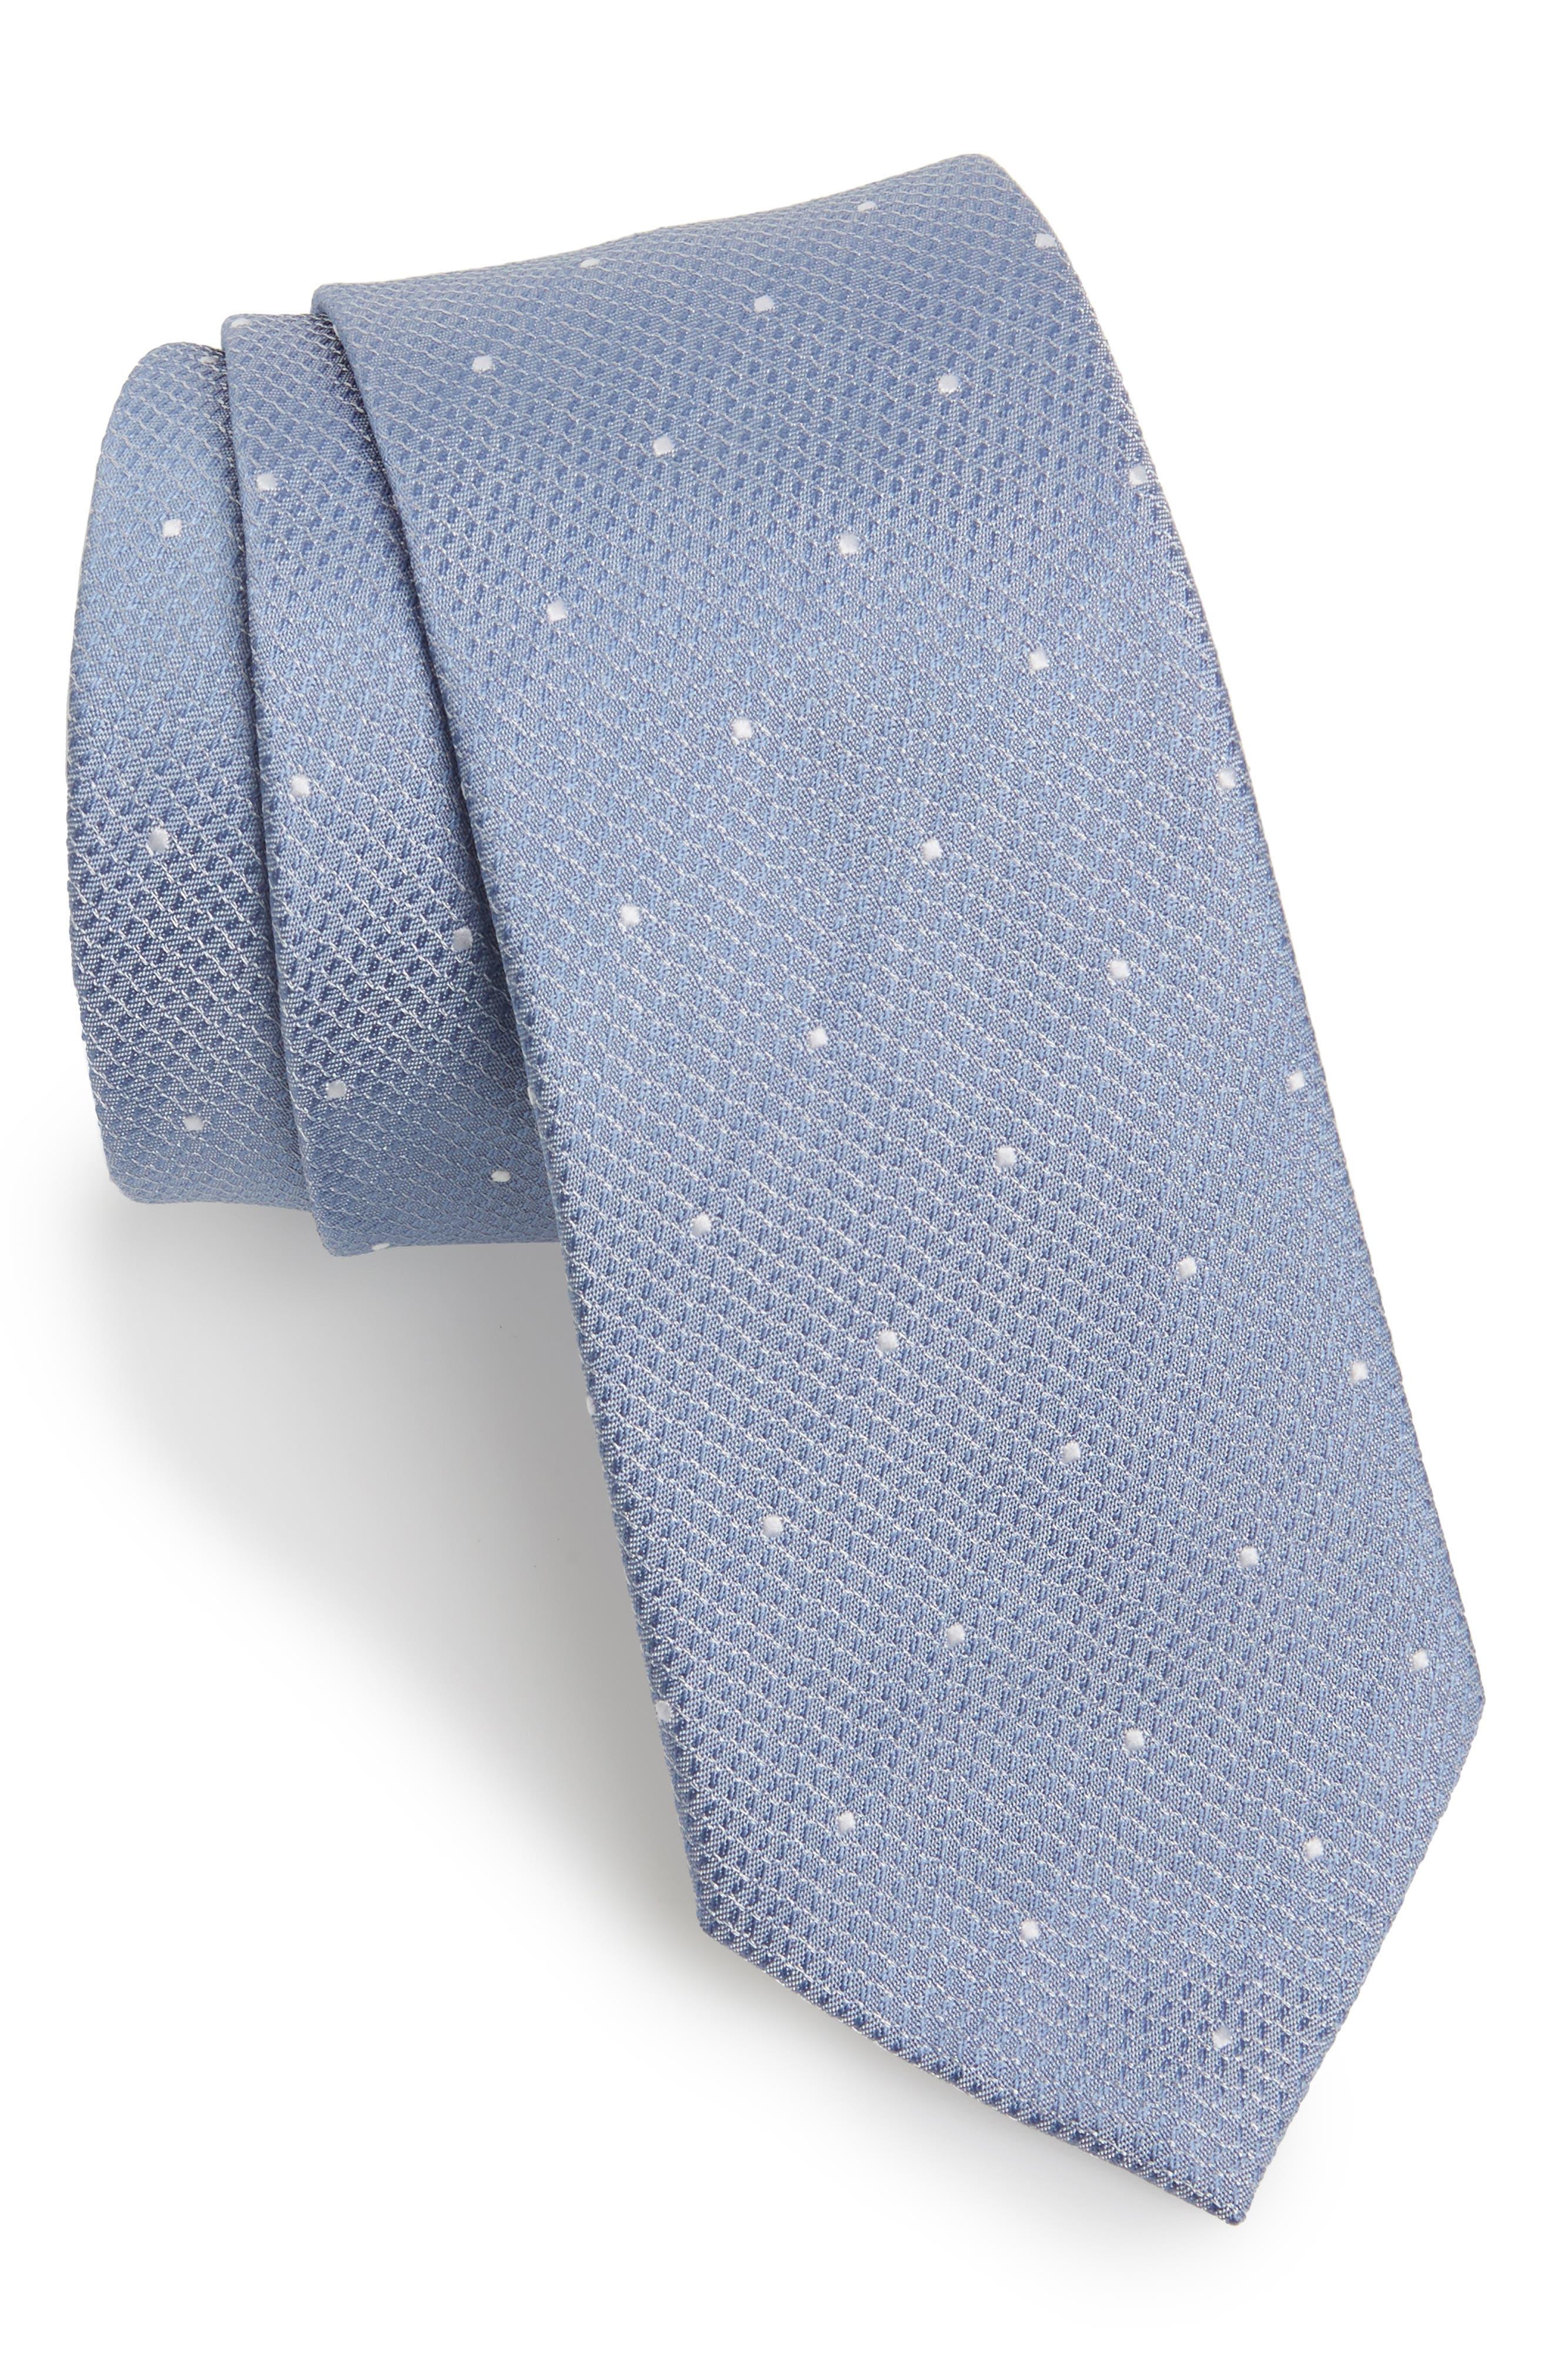 Alternate Image 1 Selected - Topman Dot Woven Tie